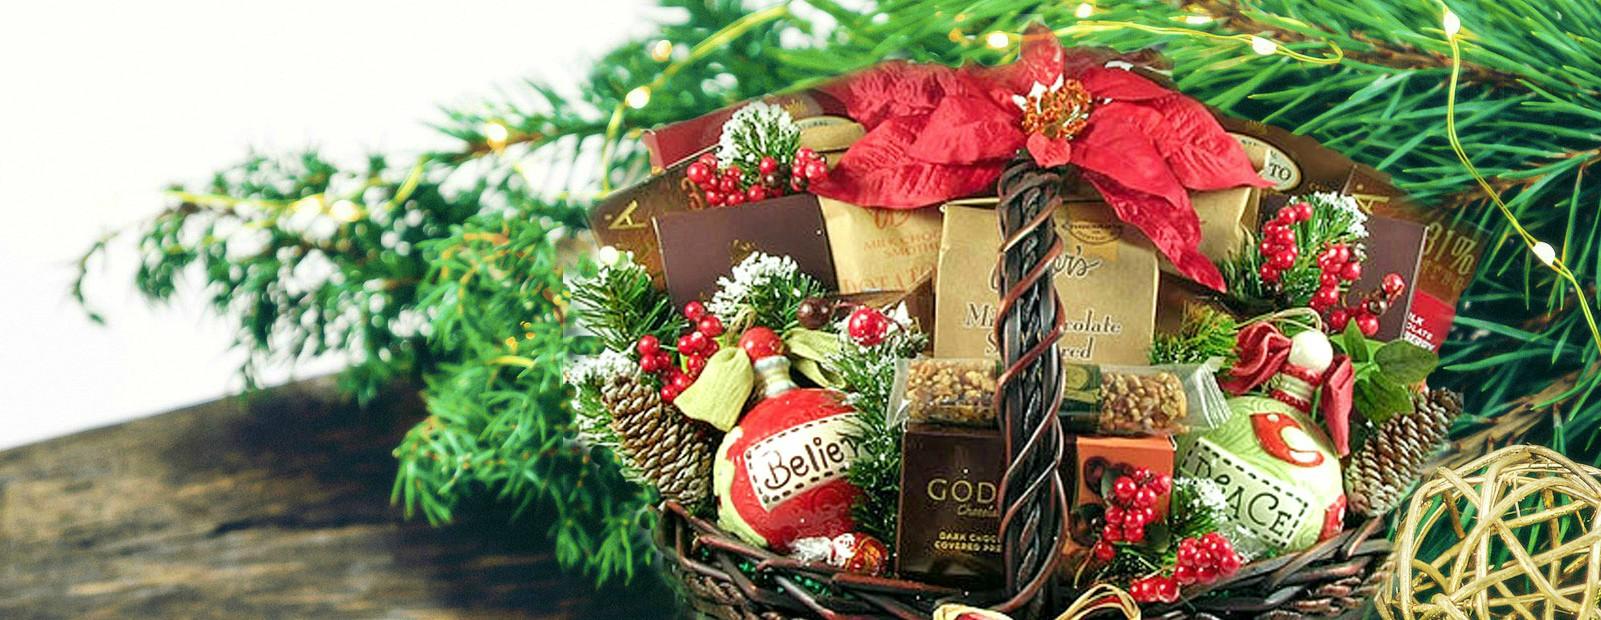 send holiday gift baskets